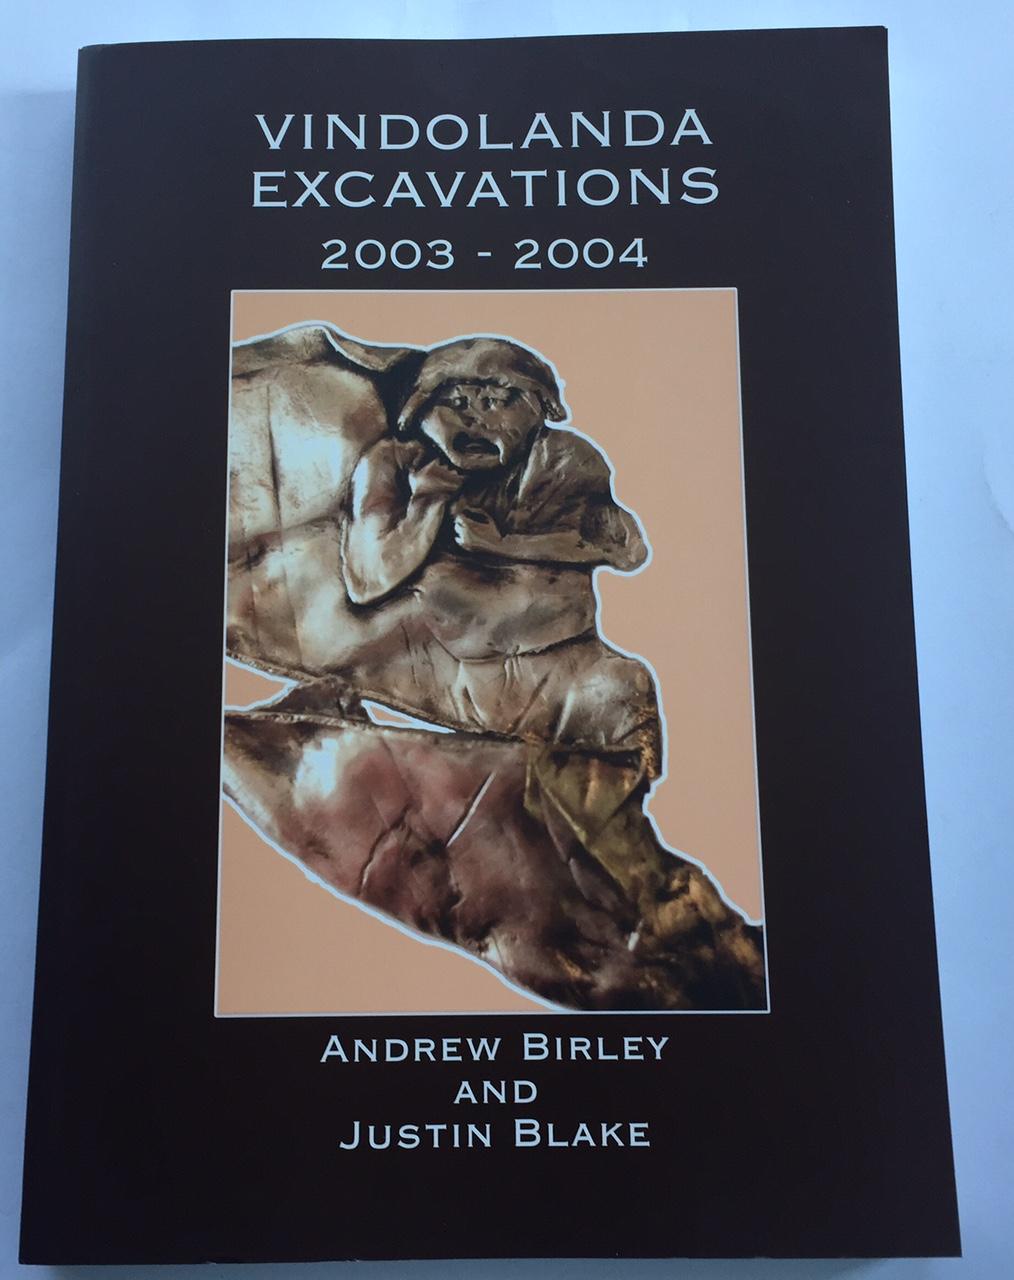 Vindolanda the excavations of 2003-2004 :, Birley, Andrew ;Blake, Justin